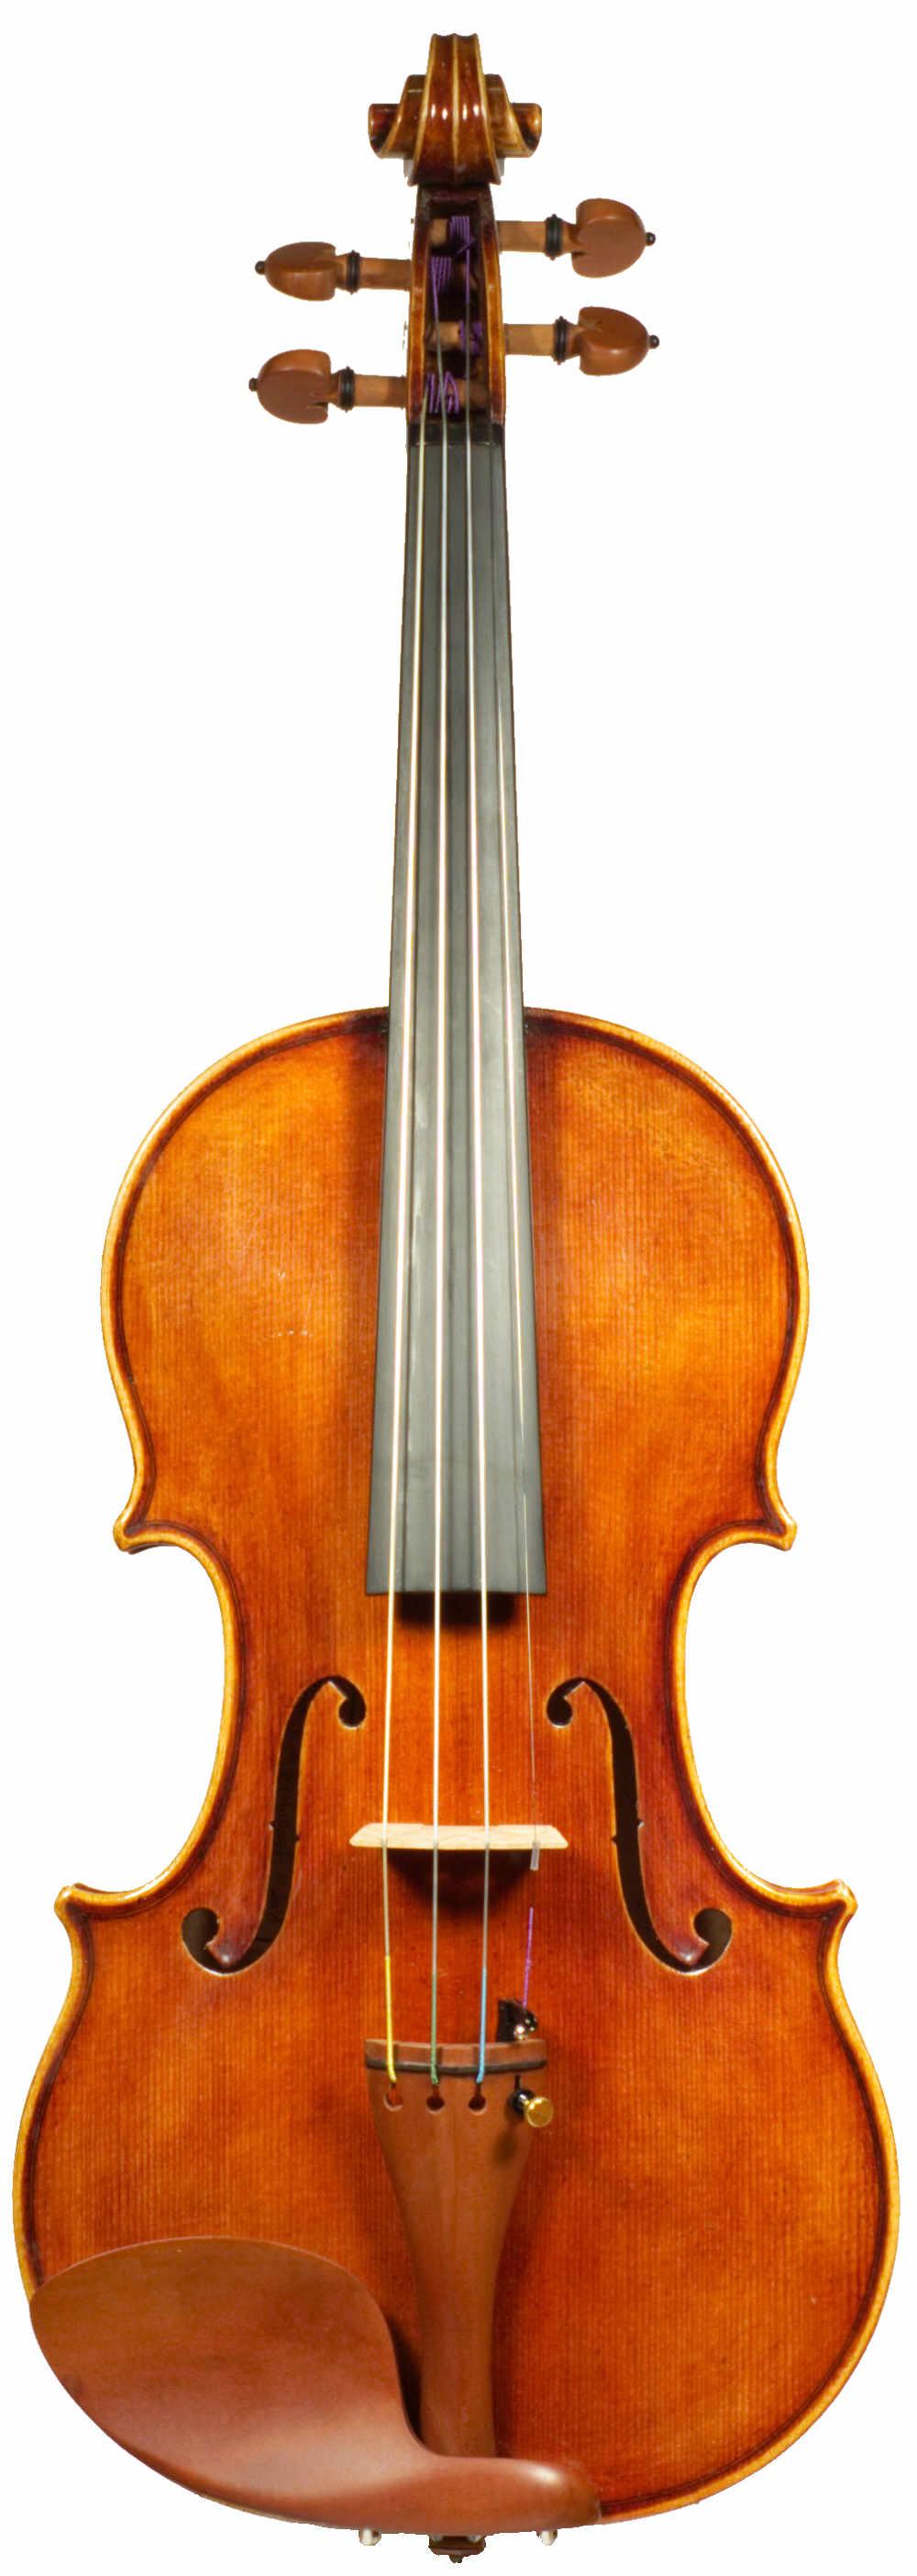 Carlo Moretti violin by Amber Strings